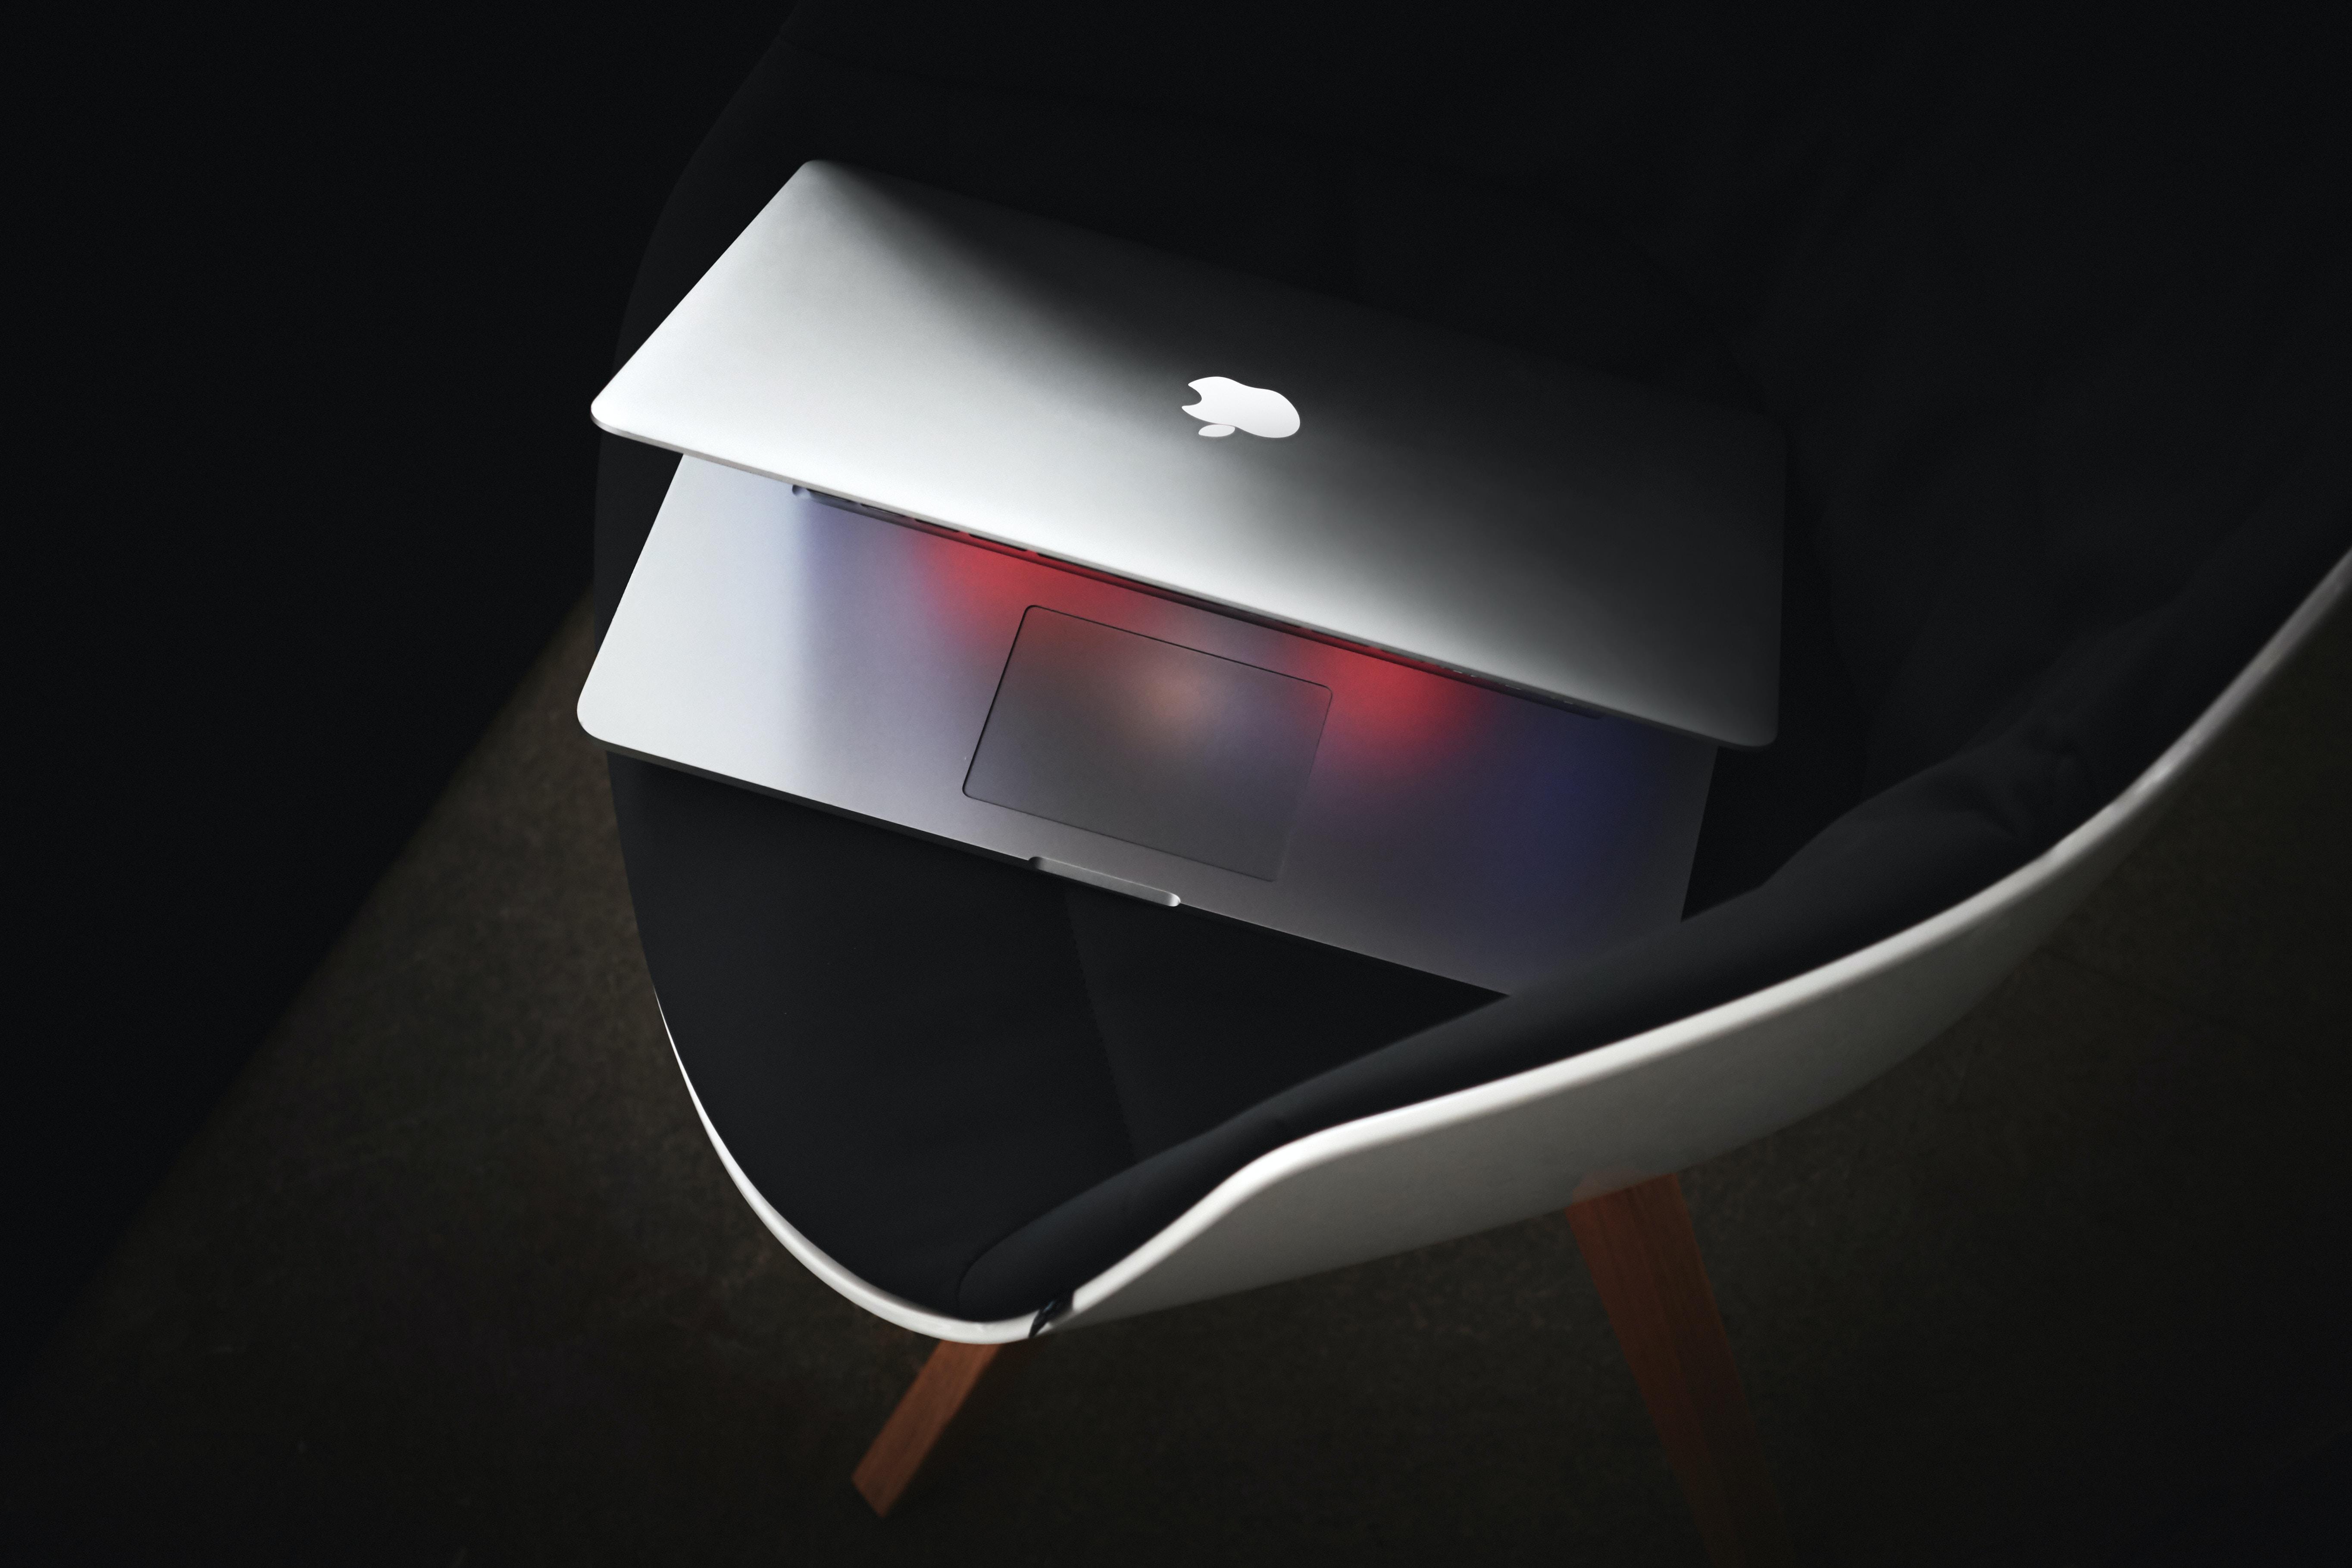 MacBook Pro on black padded chair